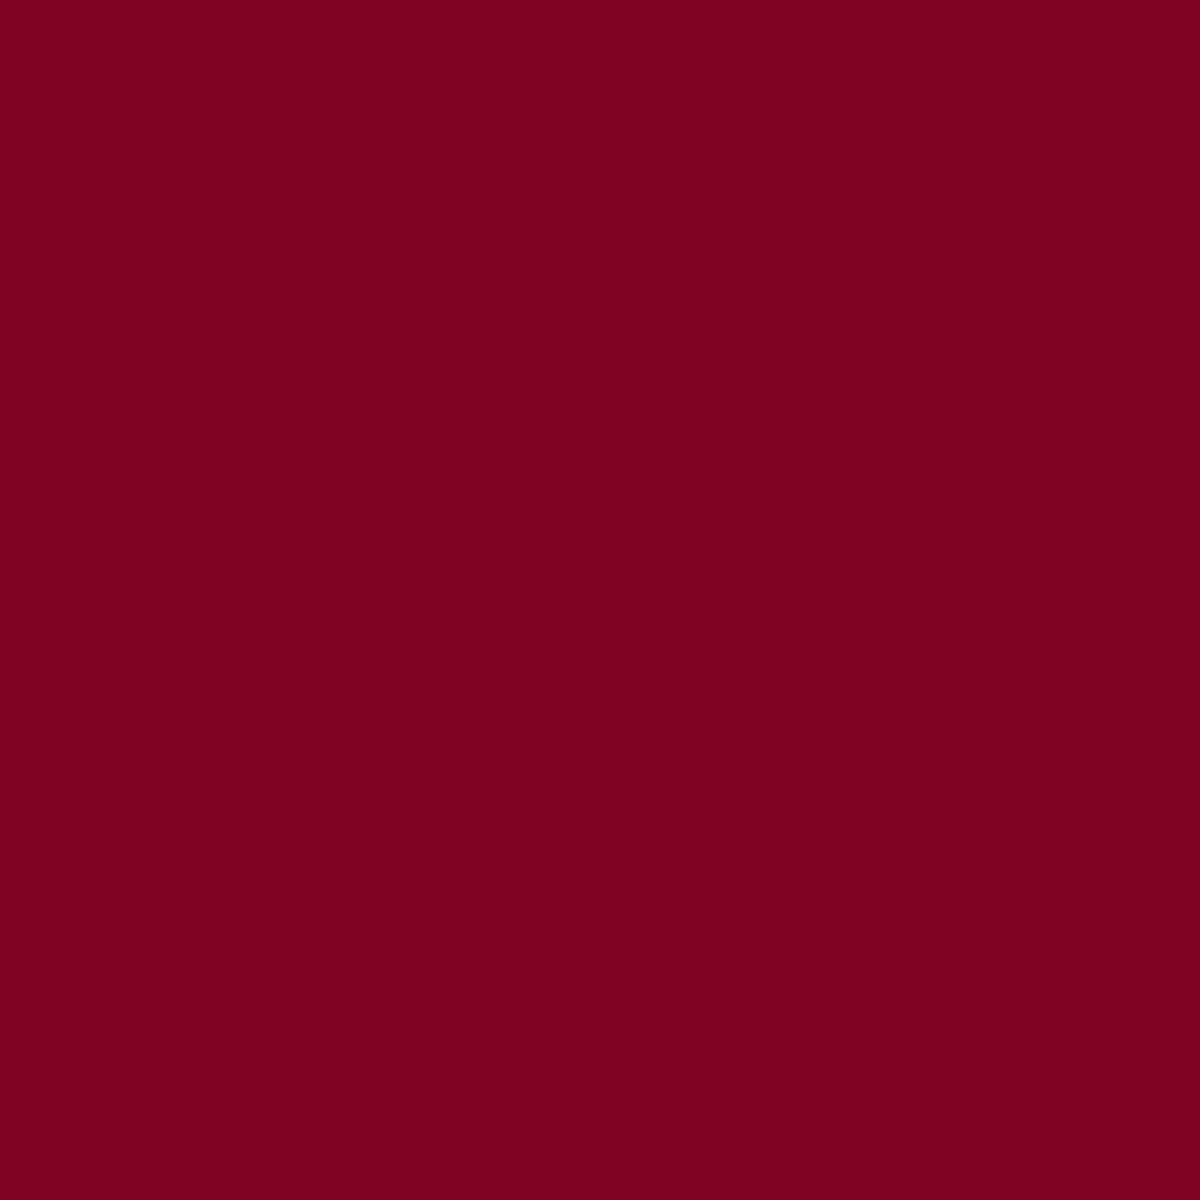 Виниловая самоклеющаяся пленка (глянец) G-3221 (1,06м х45,7м)